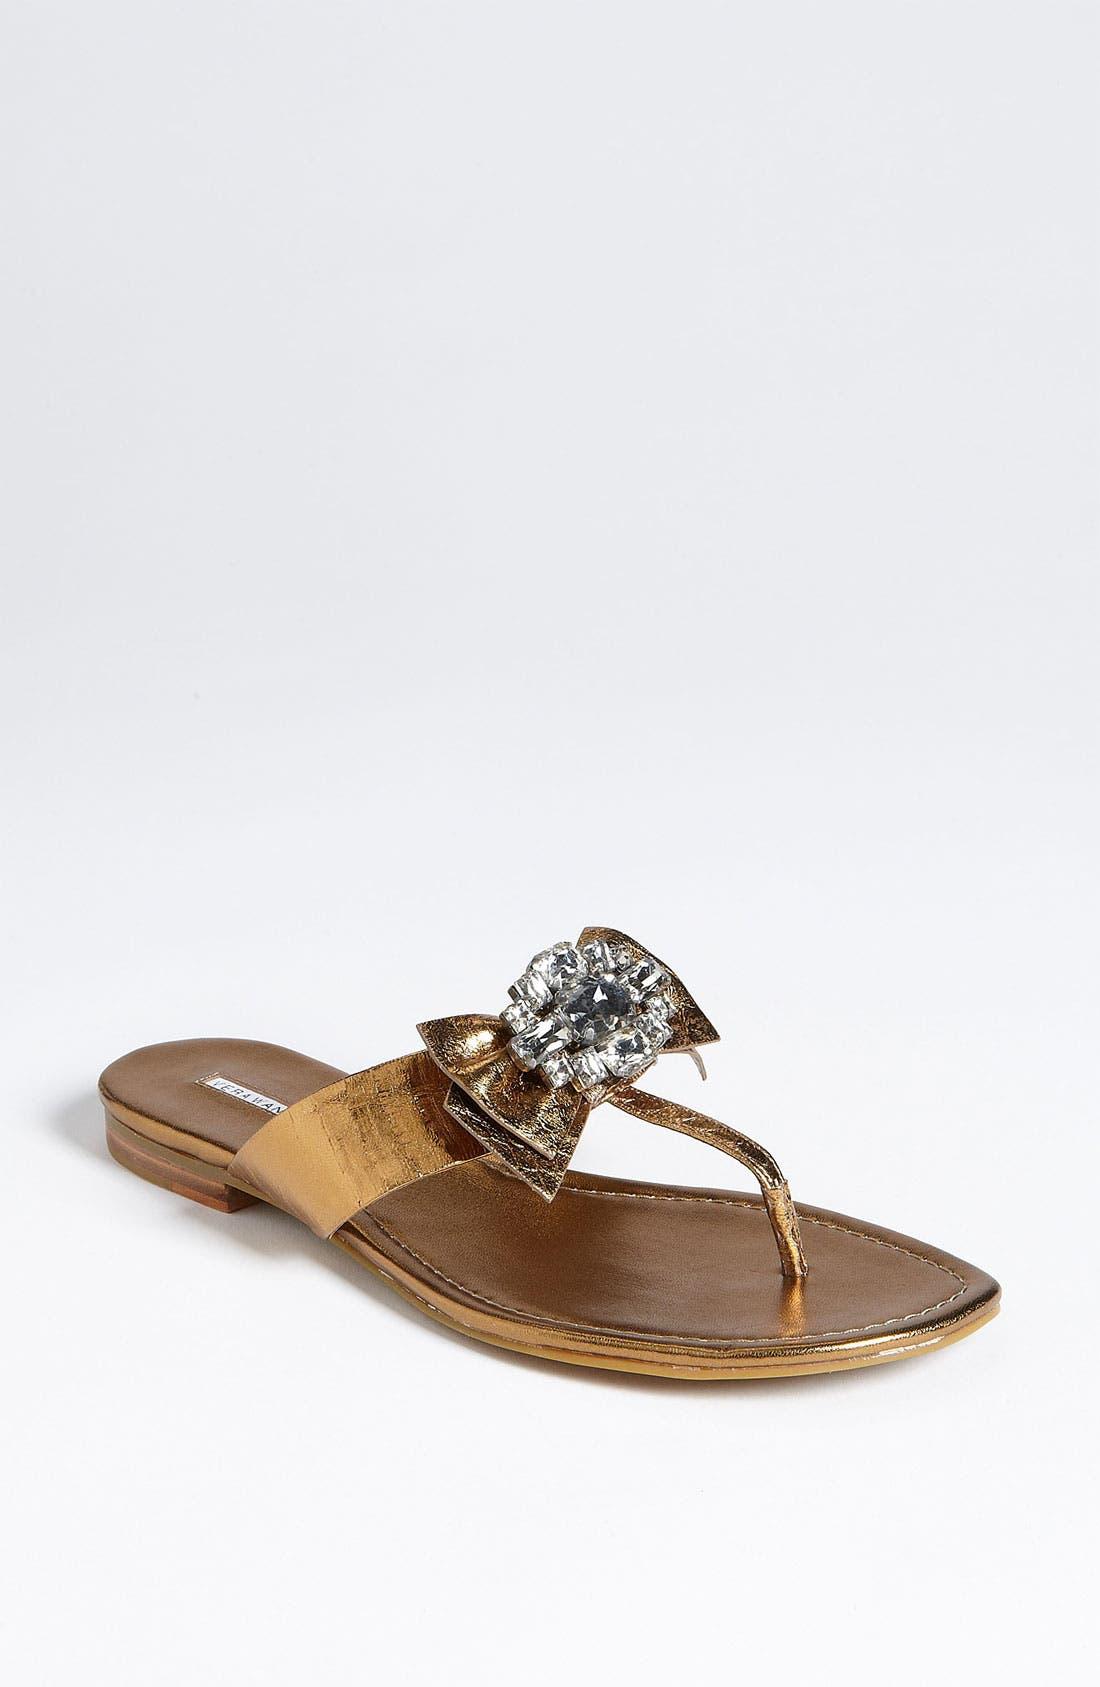 Alternate Image 1 Selected - Vera Wang Footwear 'Willa' Sandal